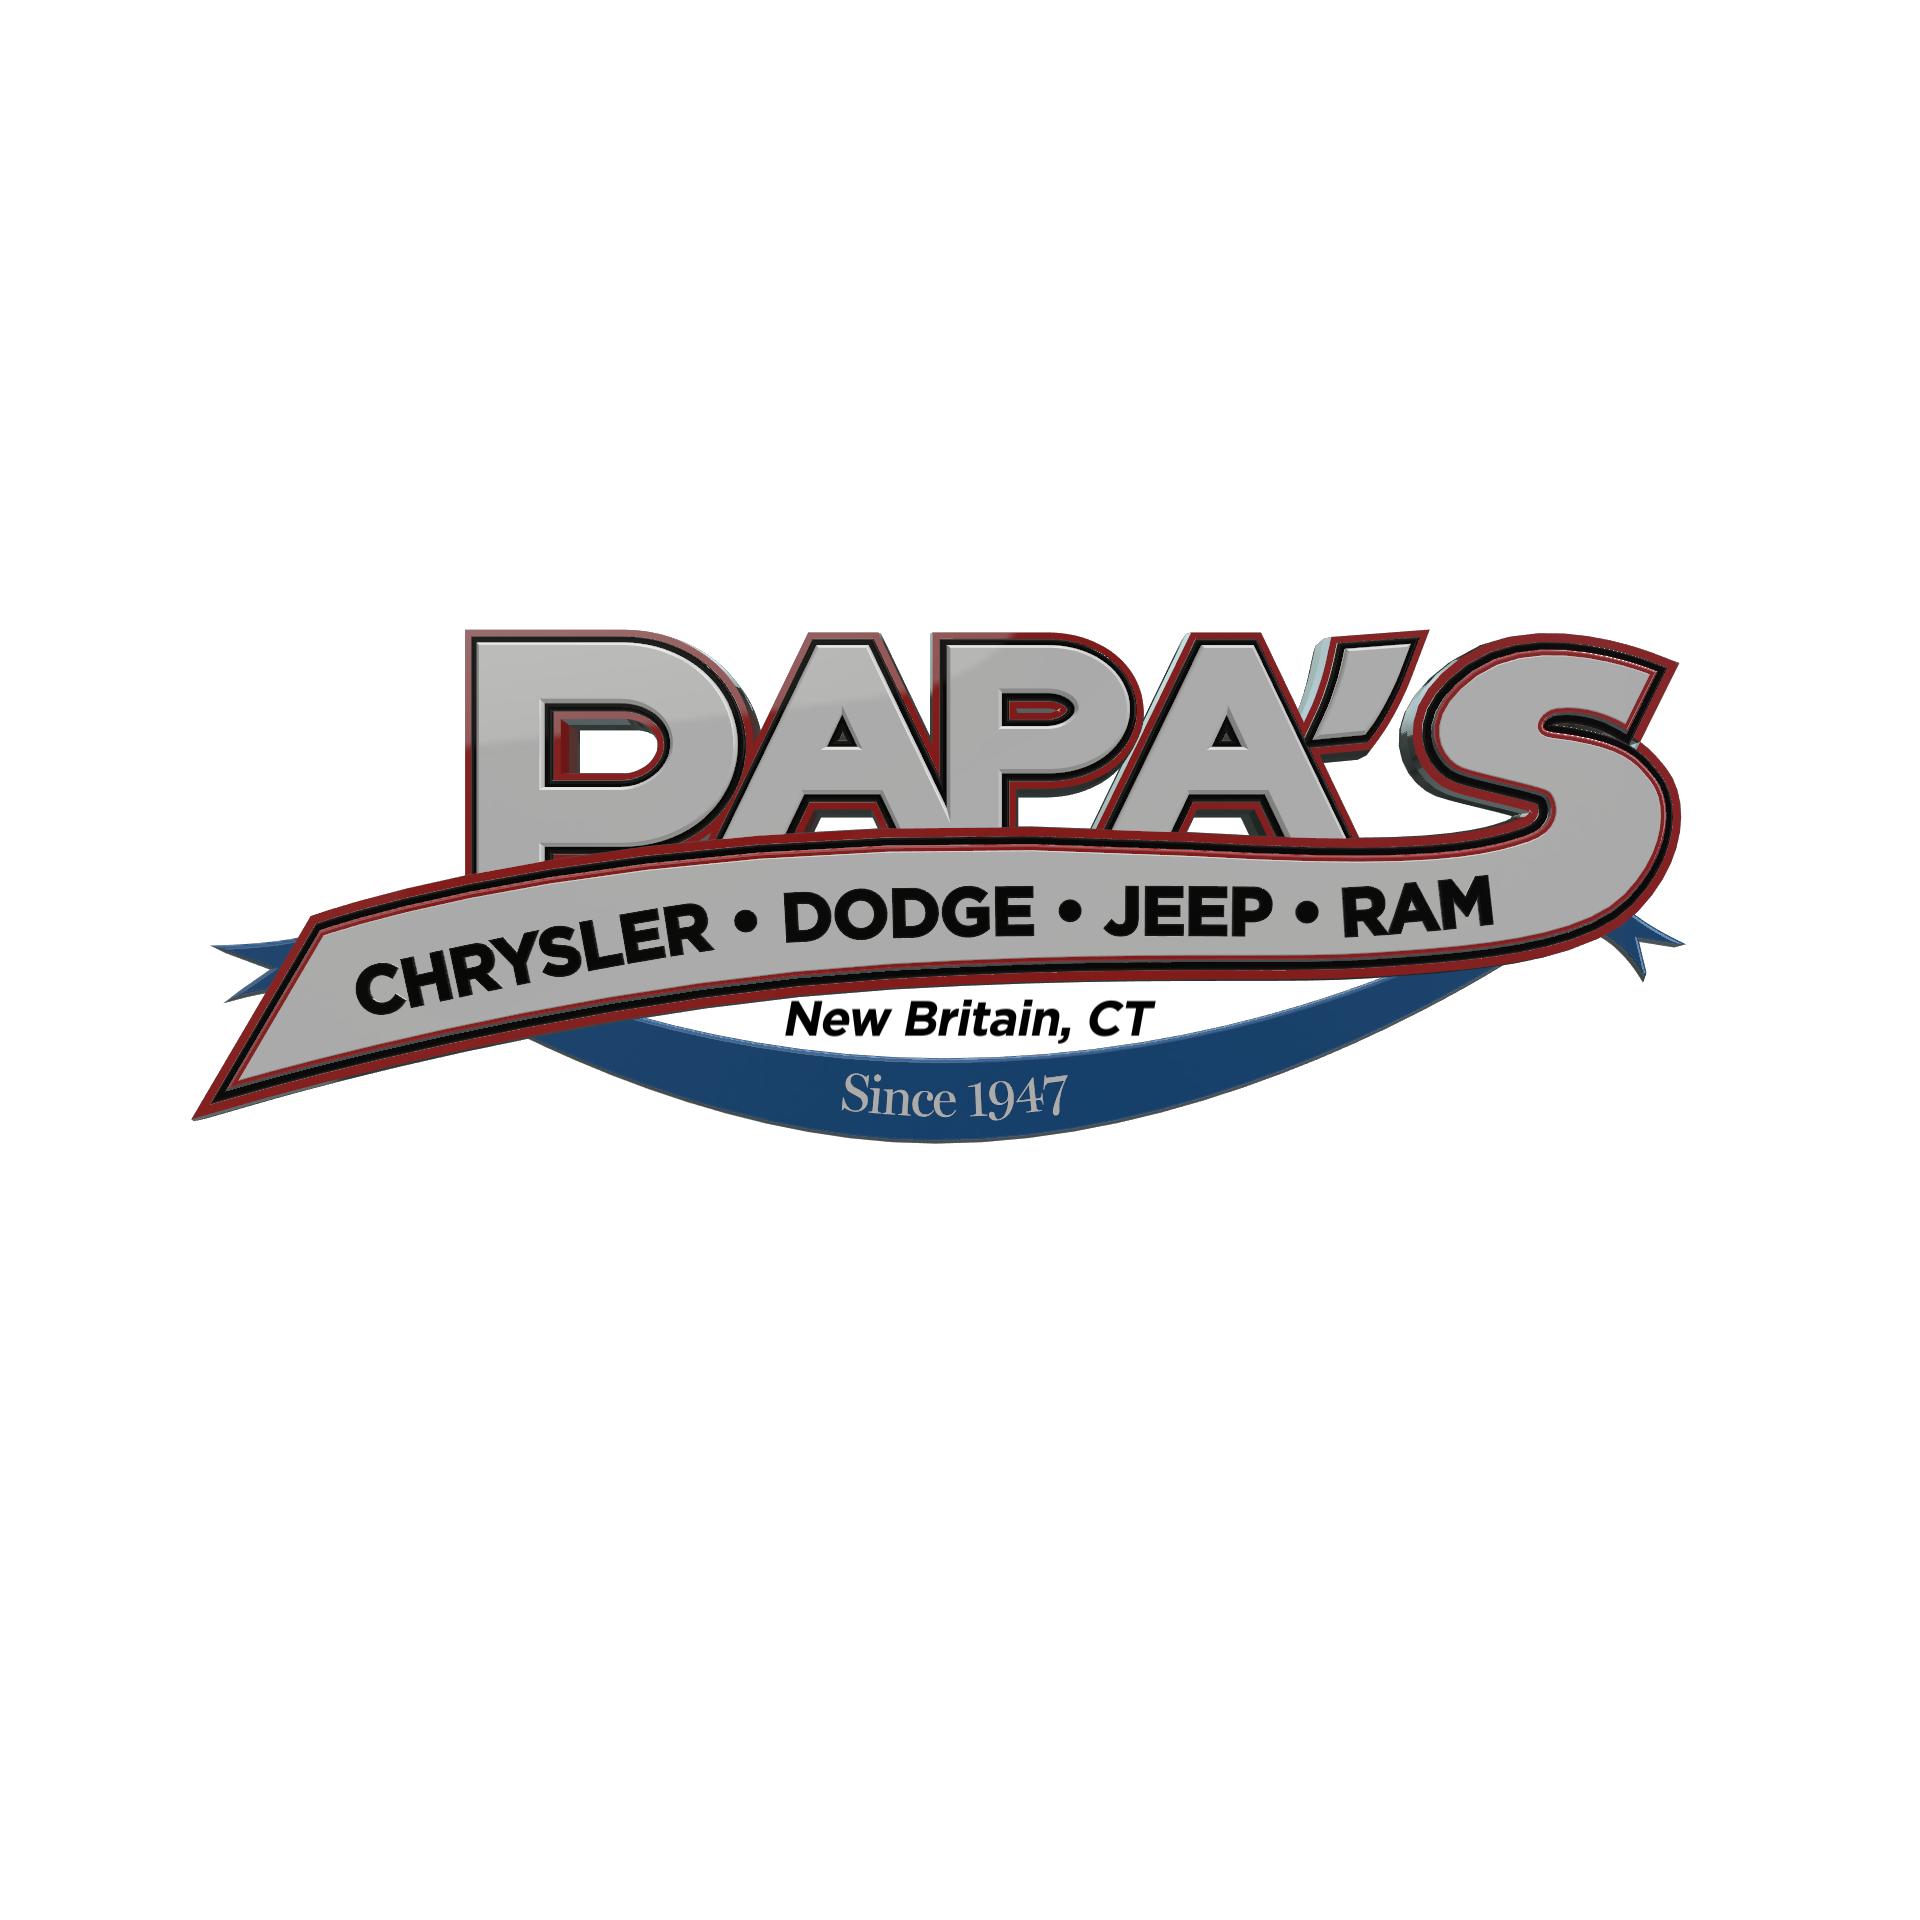 papas chrysler dodge jeep ram new used vehicles autos post. Black Bedroom Furniture Sets. Home Design Ideas